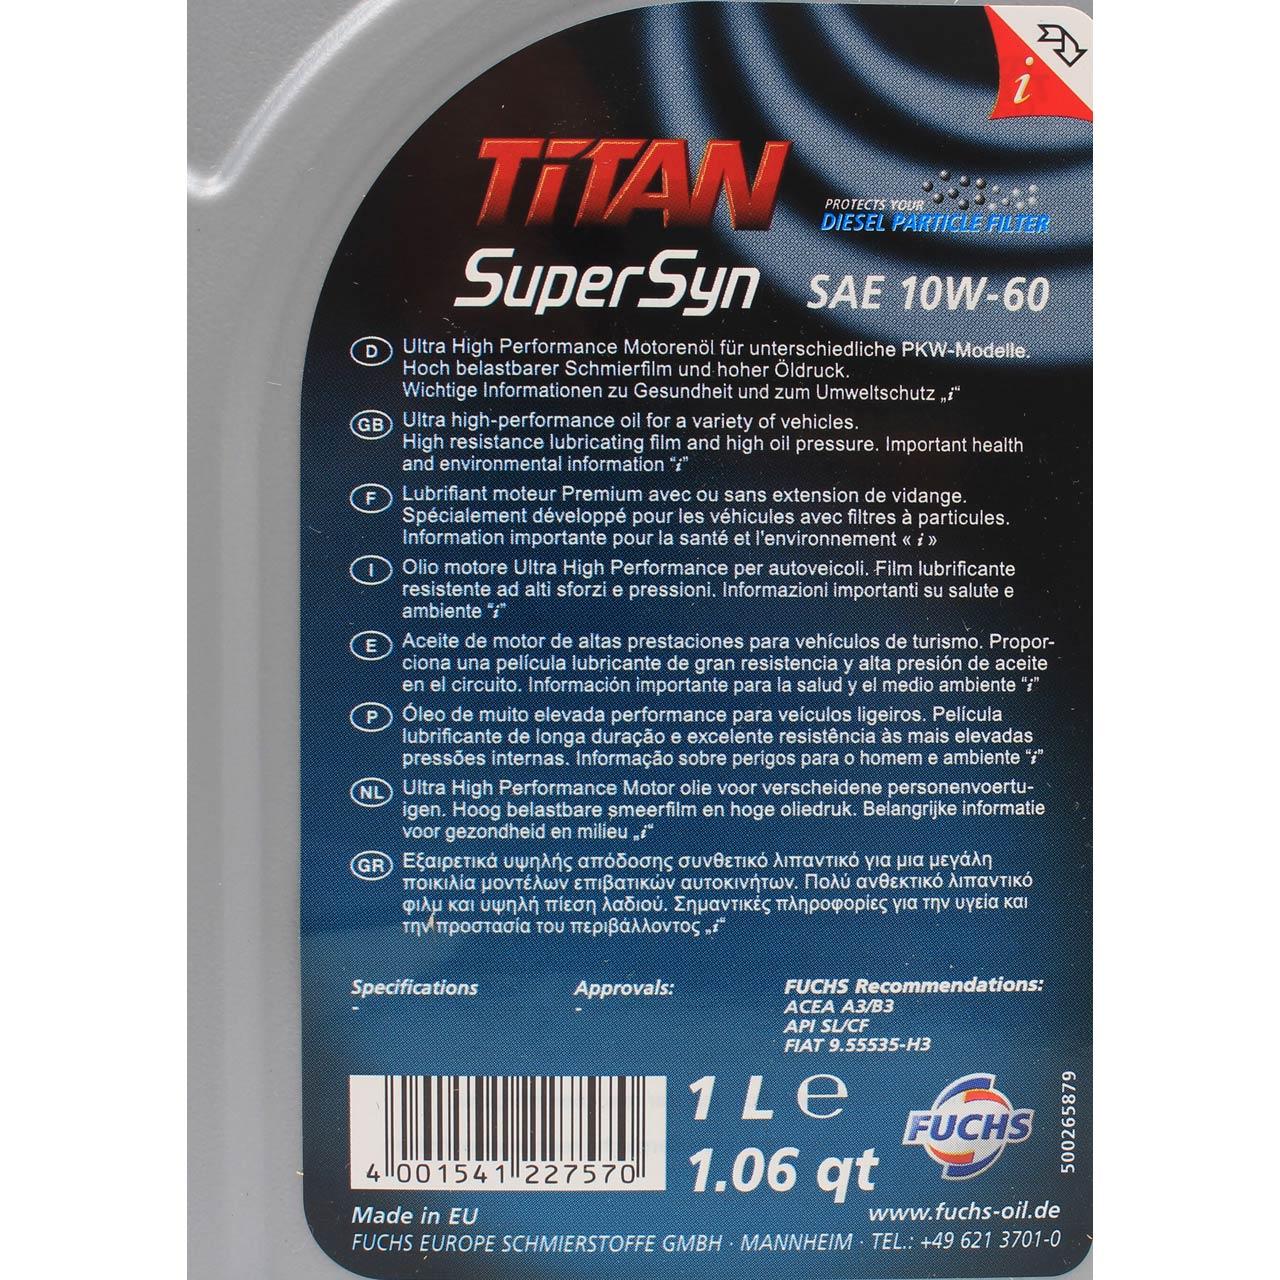 FUCHS Motoröl Öl TITAN SuperSyn ACEA A3/B3 SL/CF 10W-60 10W60 - 1L 1 Liter